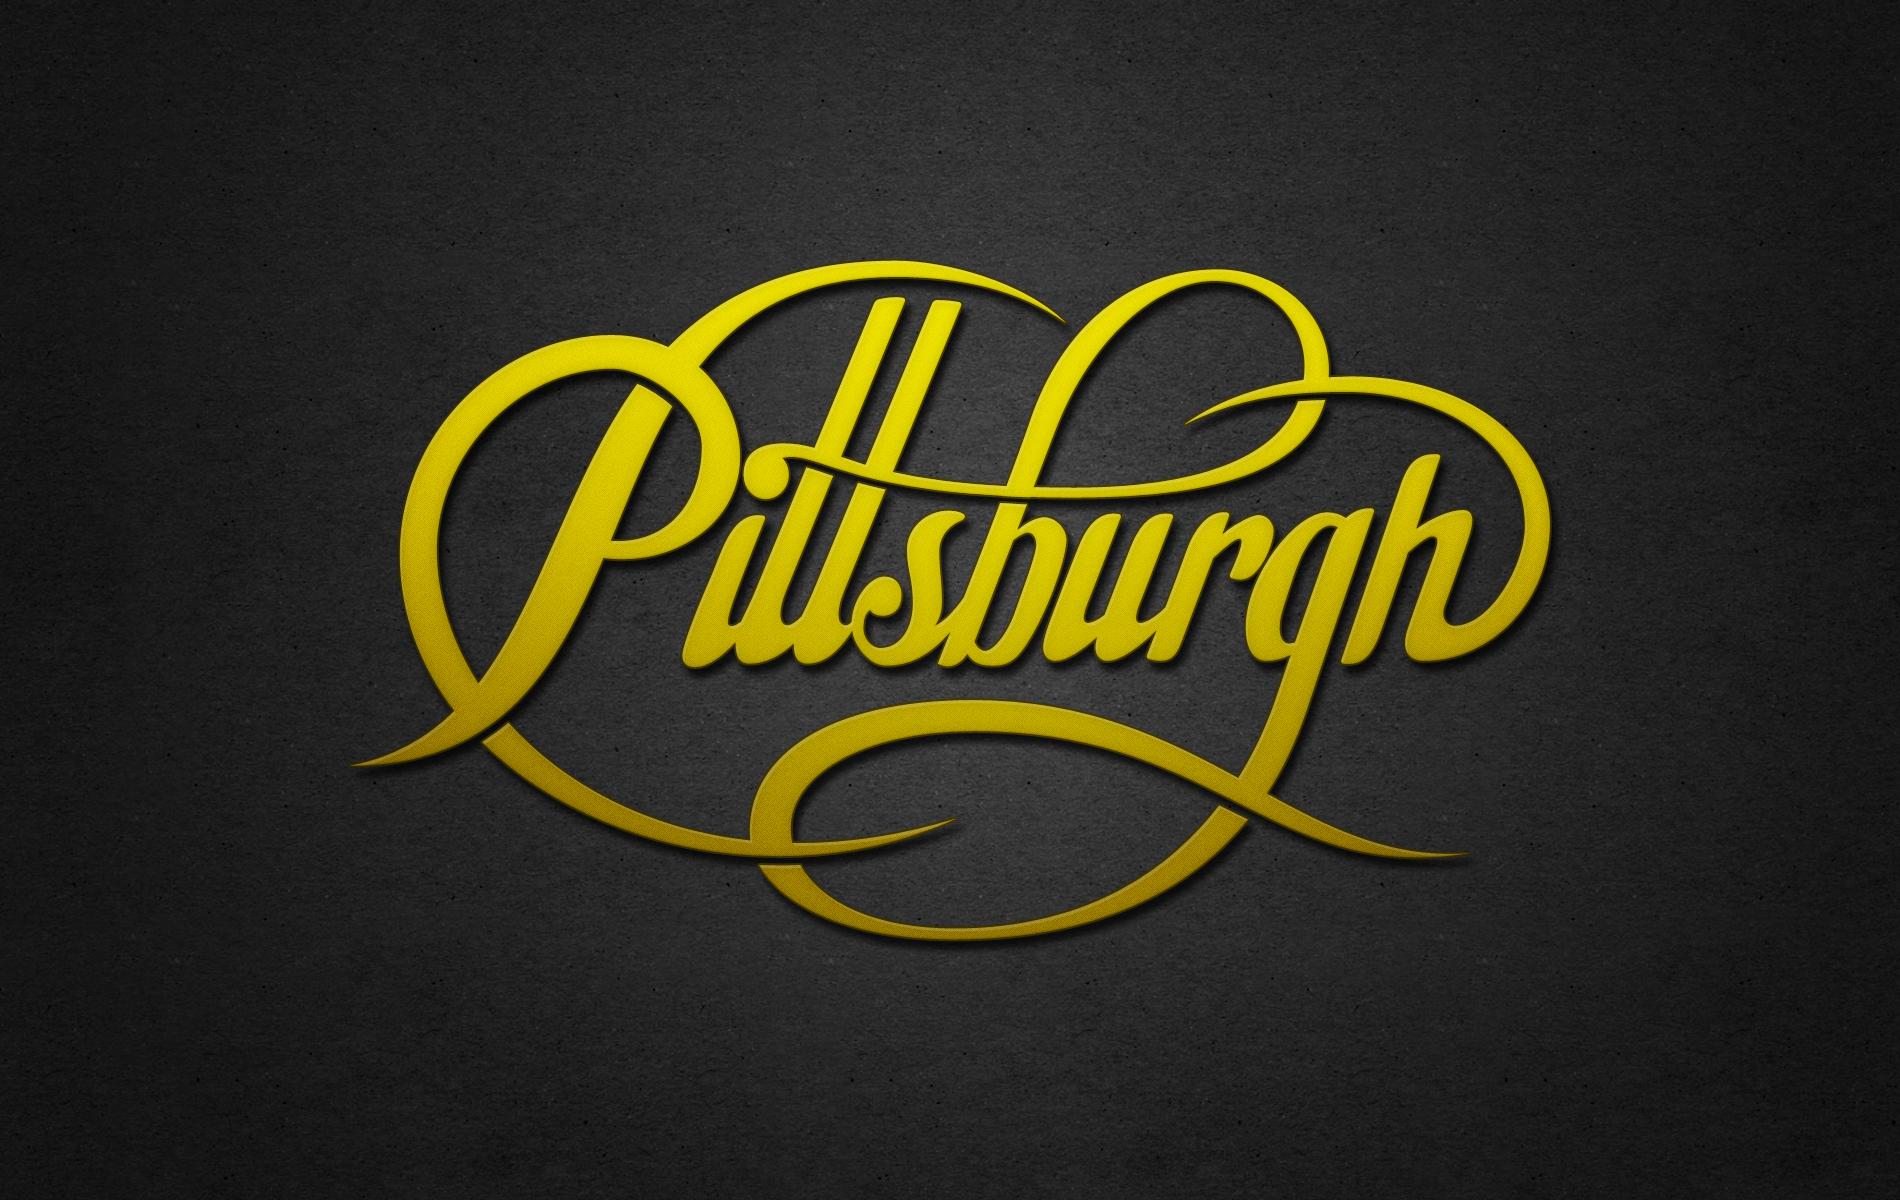 50 Pittsburgh Steelers Wallpaper Downloads On Wallpapersafari